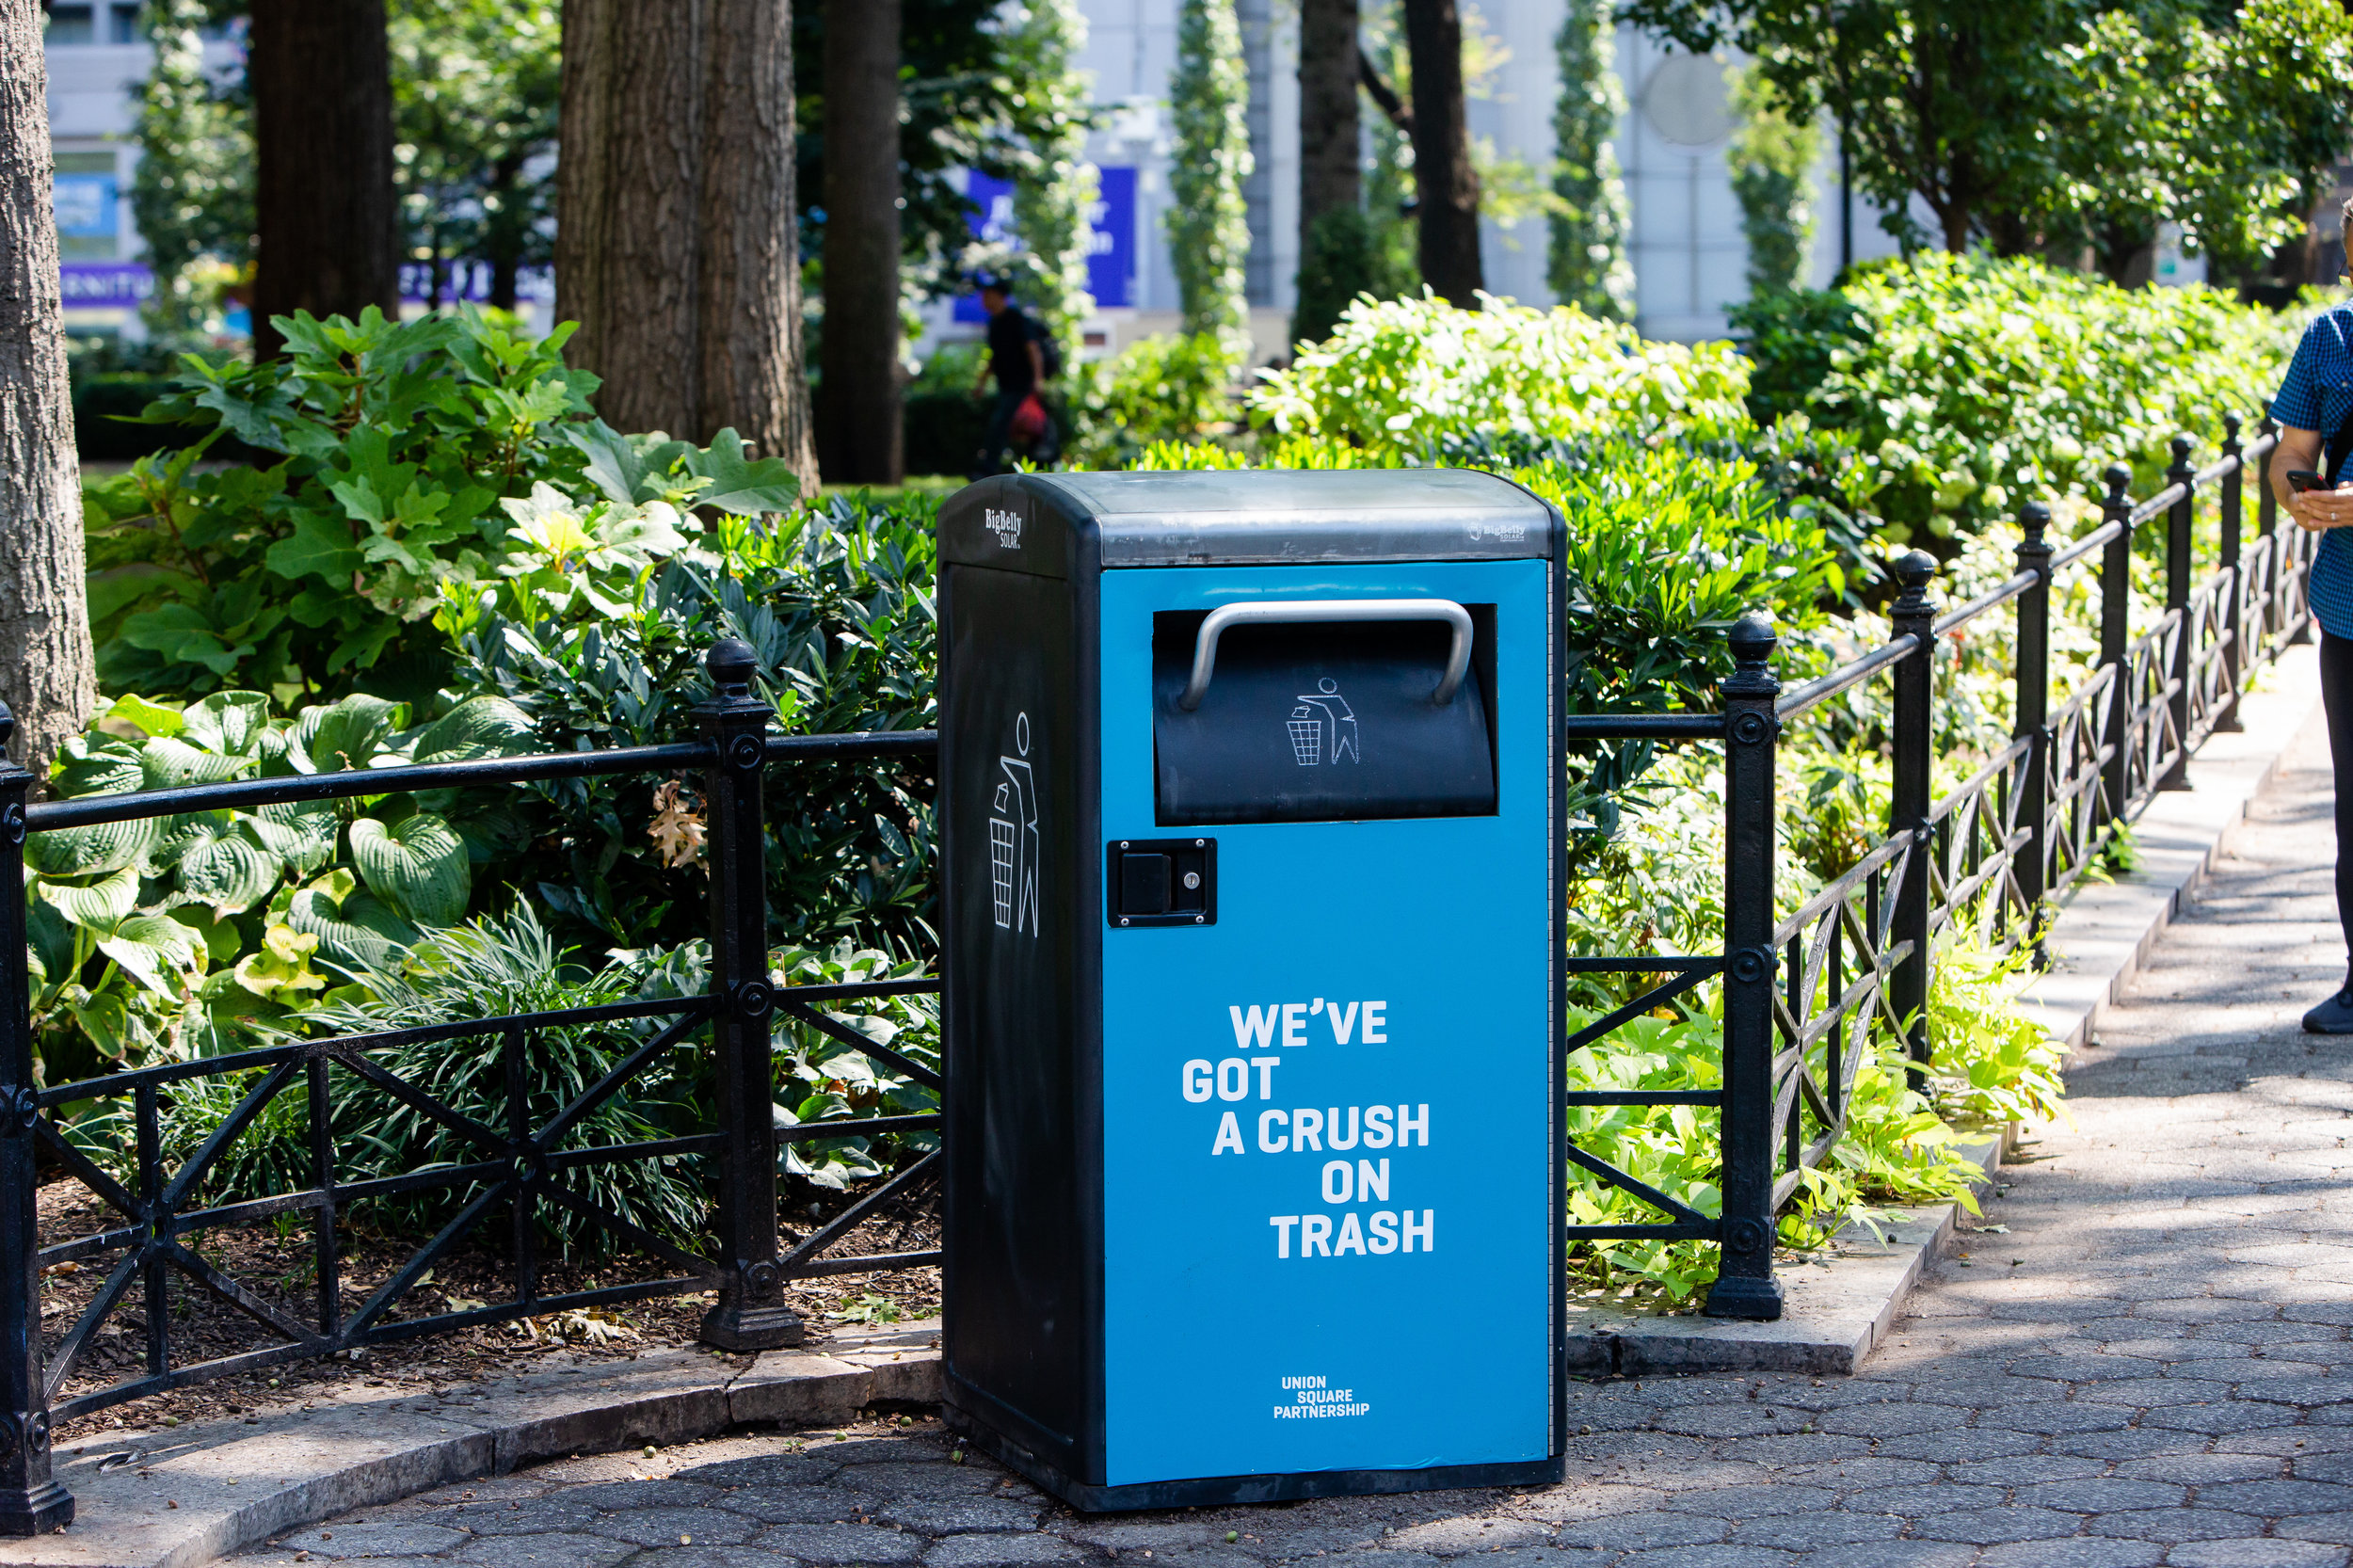 Union Square Park Trash Can photo by Liz Ligon